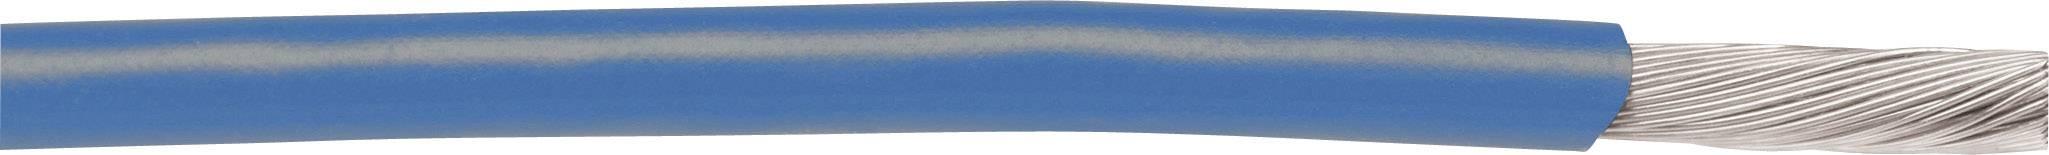 Pletenica EcoWire 1 x 0.82 mm, modra AlphaWire 6715 30.5 m